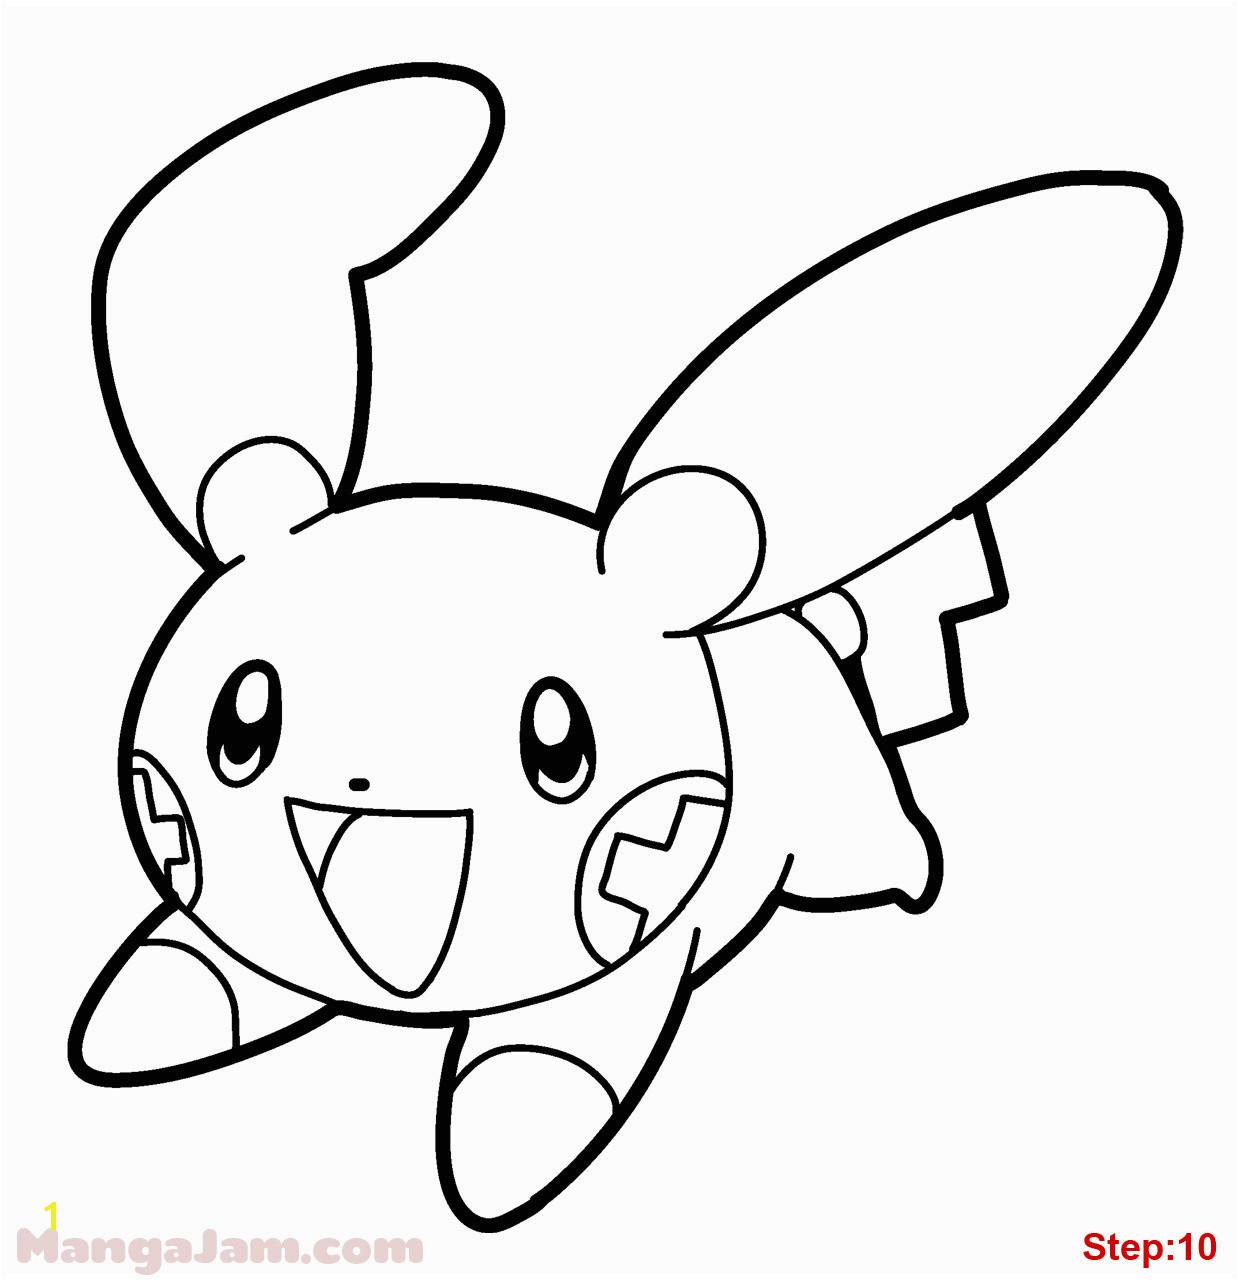 Minun Coloring Pages Plusle and Minun Electric Pokemon Coloring Page Schön Malvorlagen Pokemon Free Pokemon